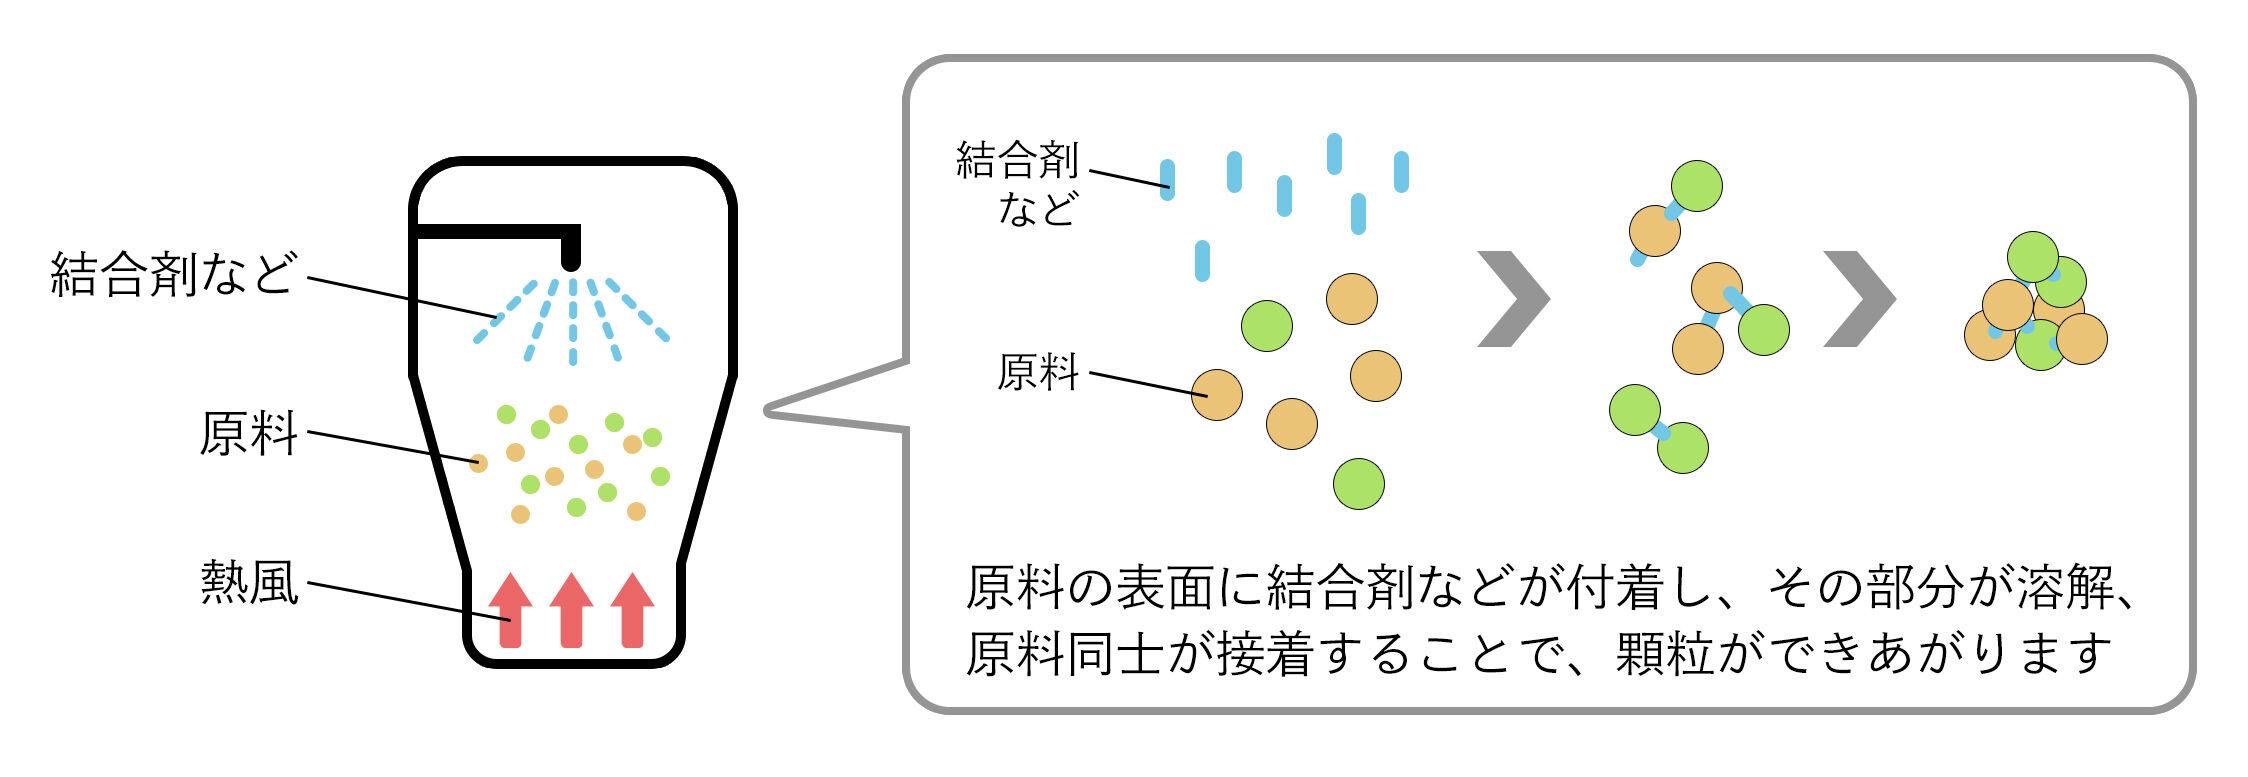 造粒工程の概要